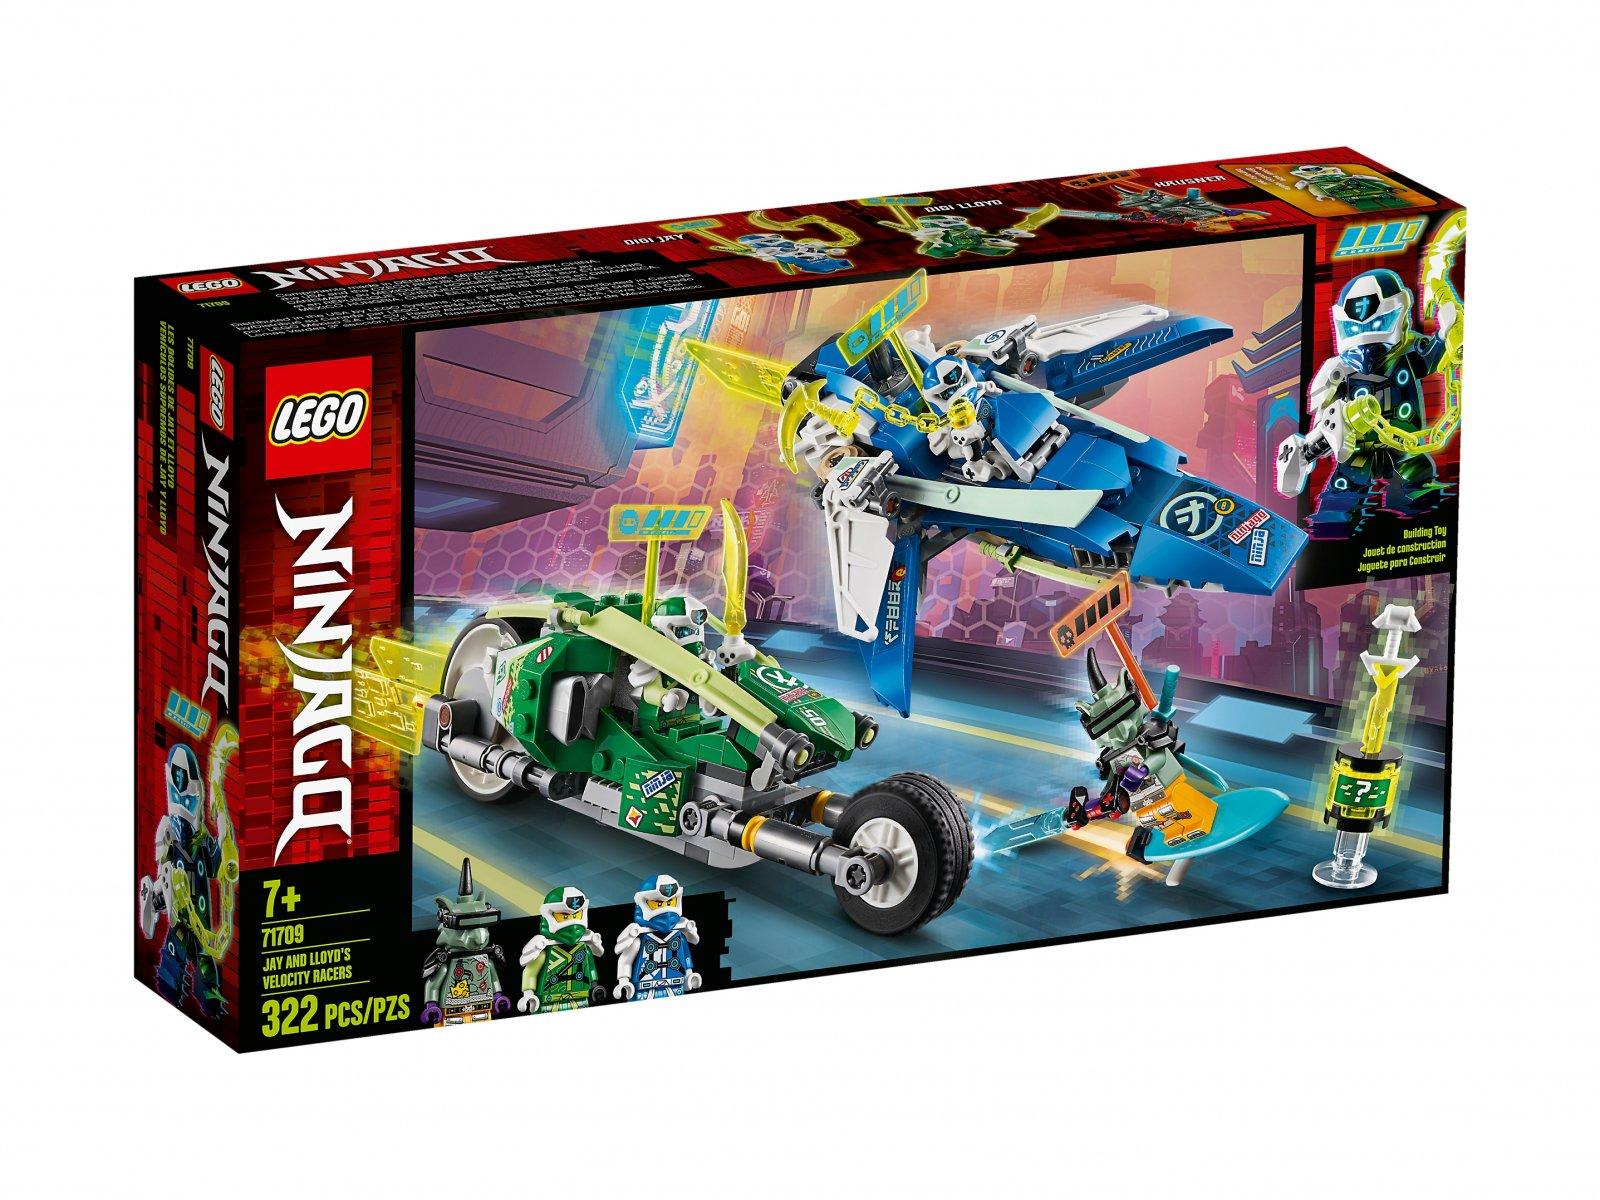 LEGO 71709 Wyścigówki Jaya i Lloyda